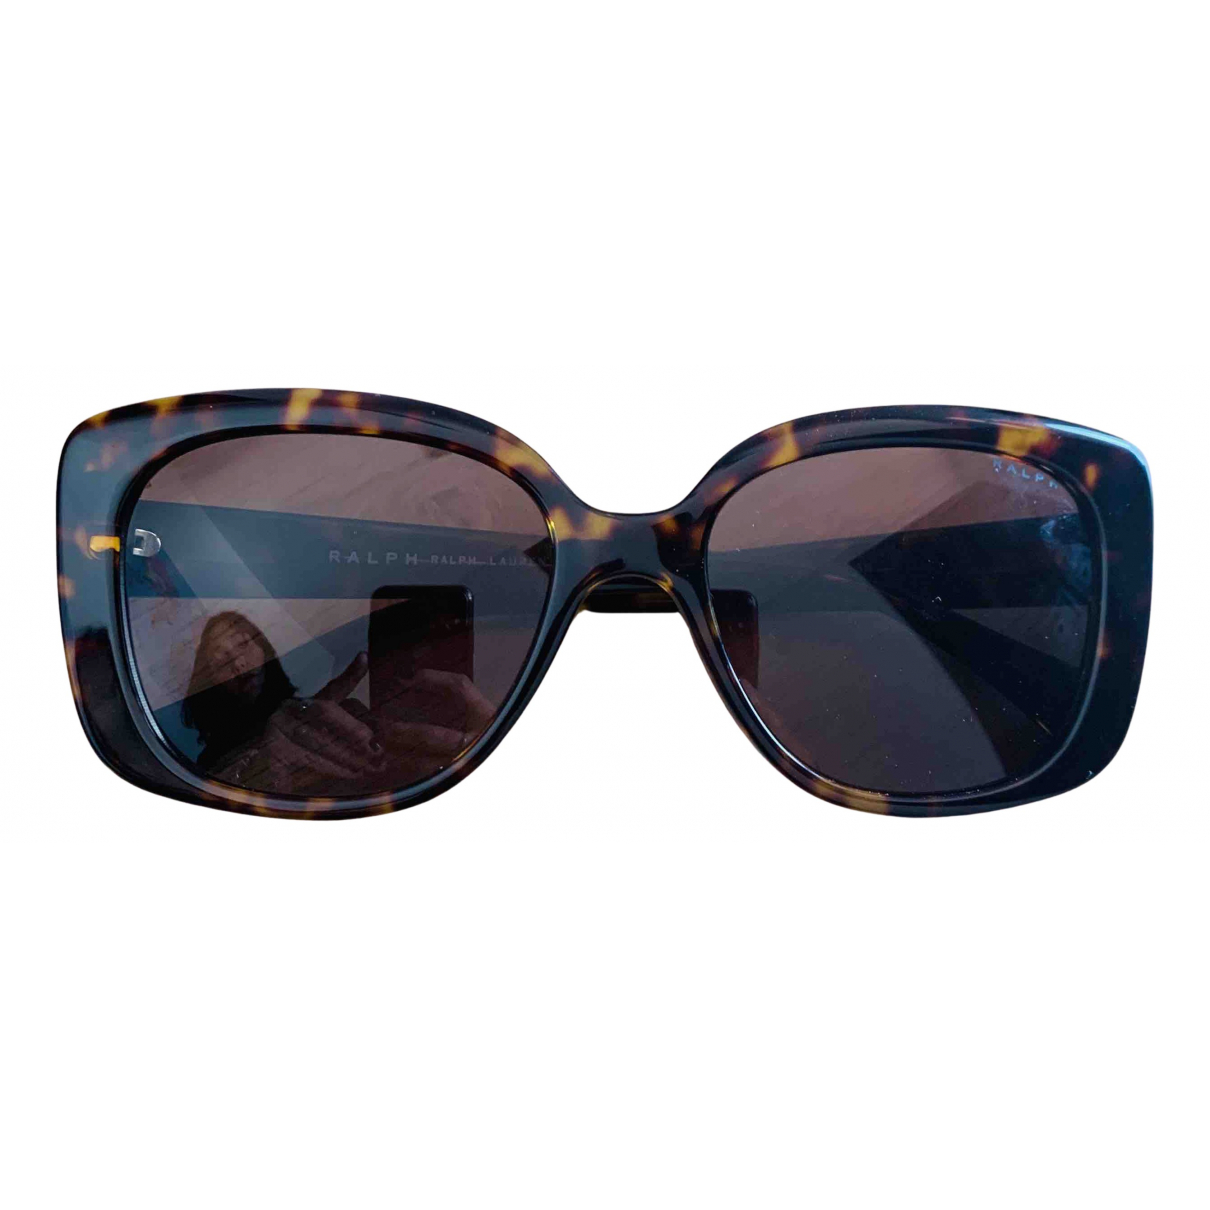 Gafas Ralph Lauren